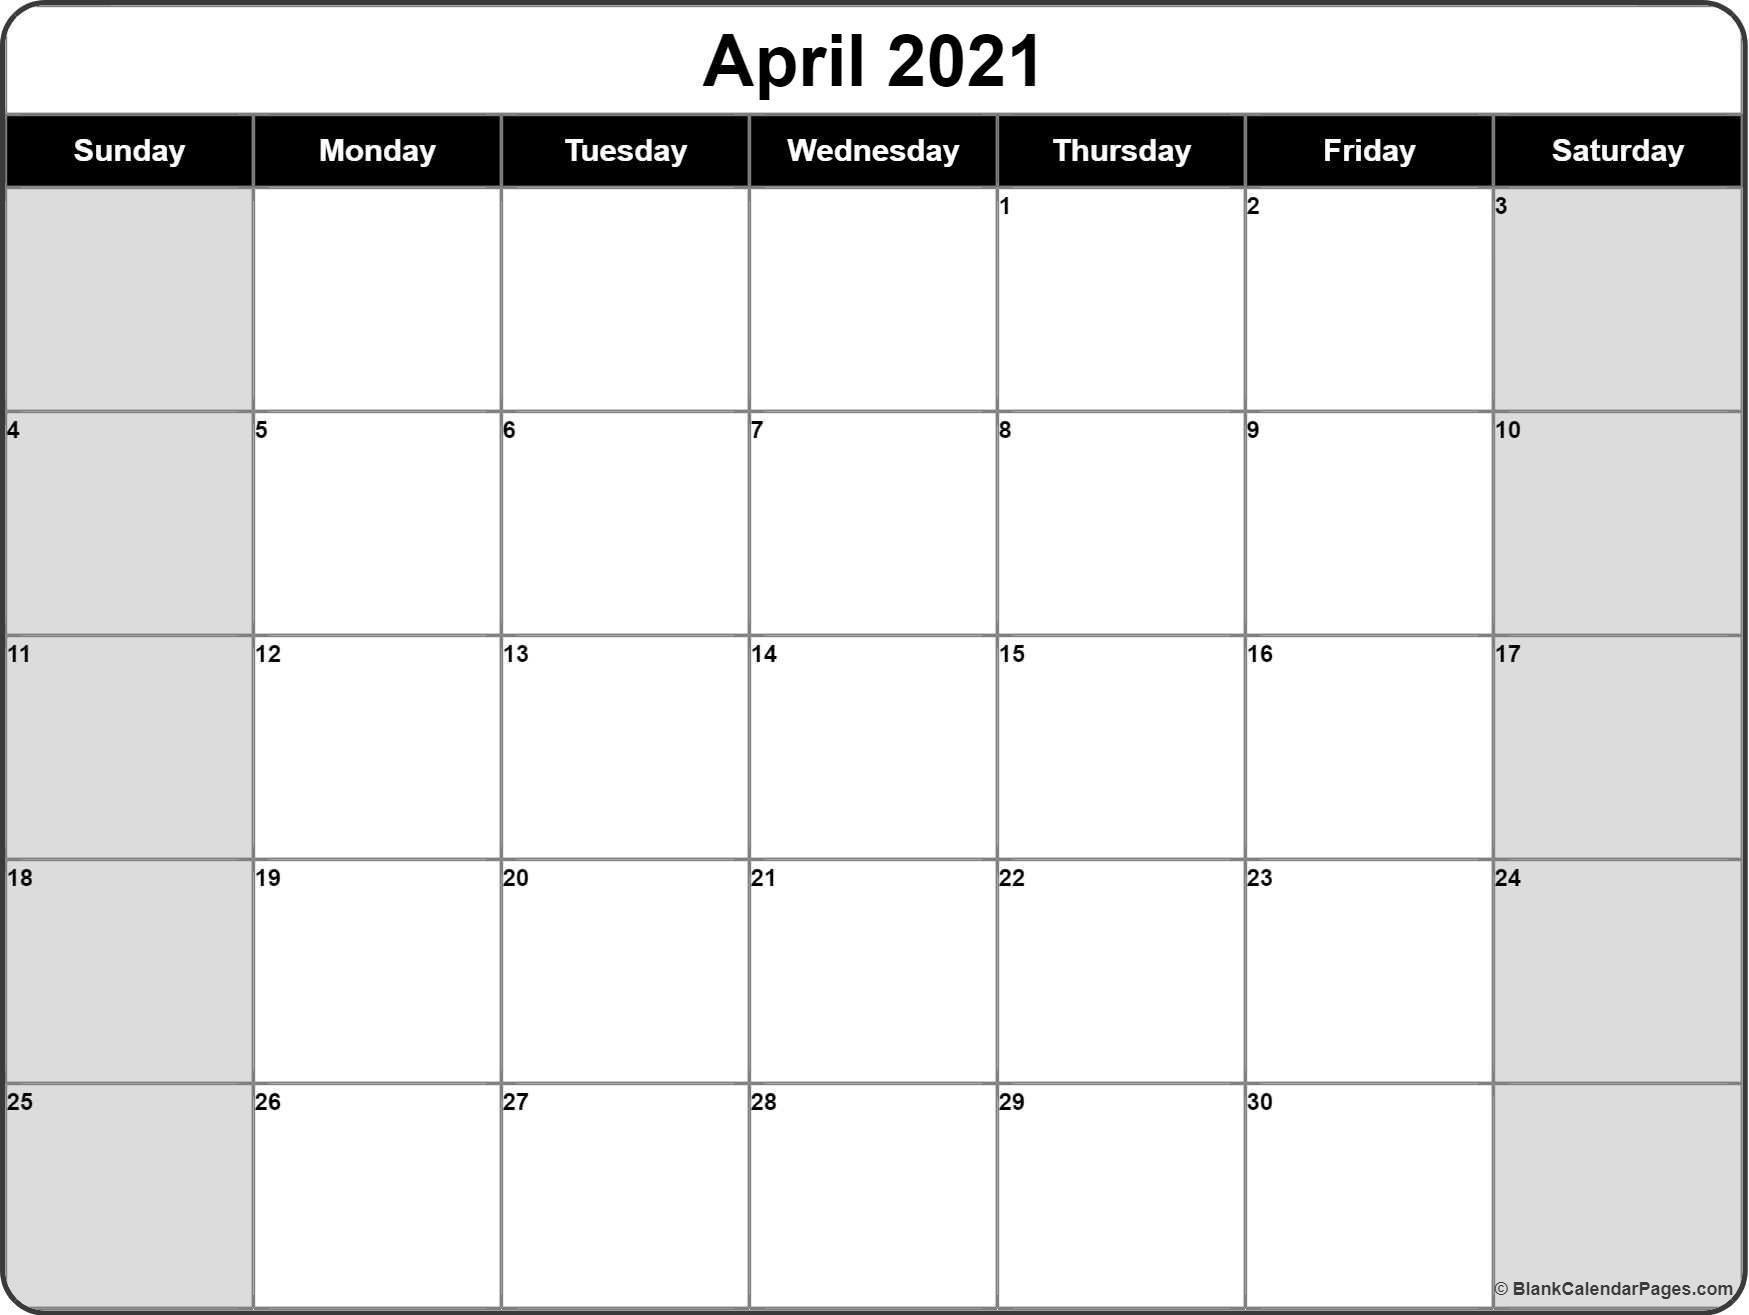 April 2021 Calendar | Free Printable Calendar Templates